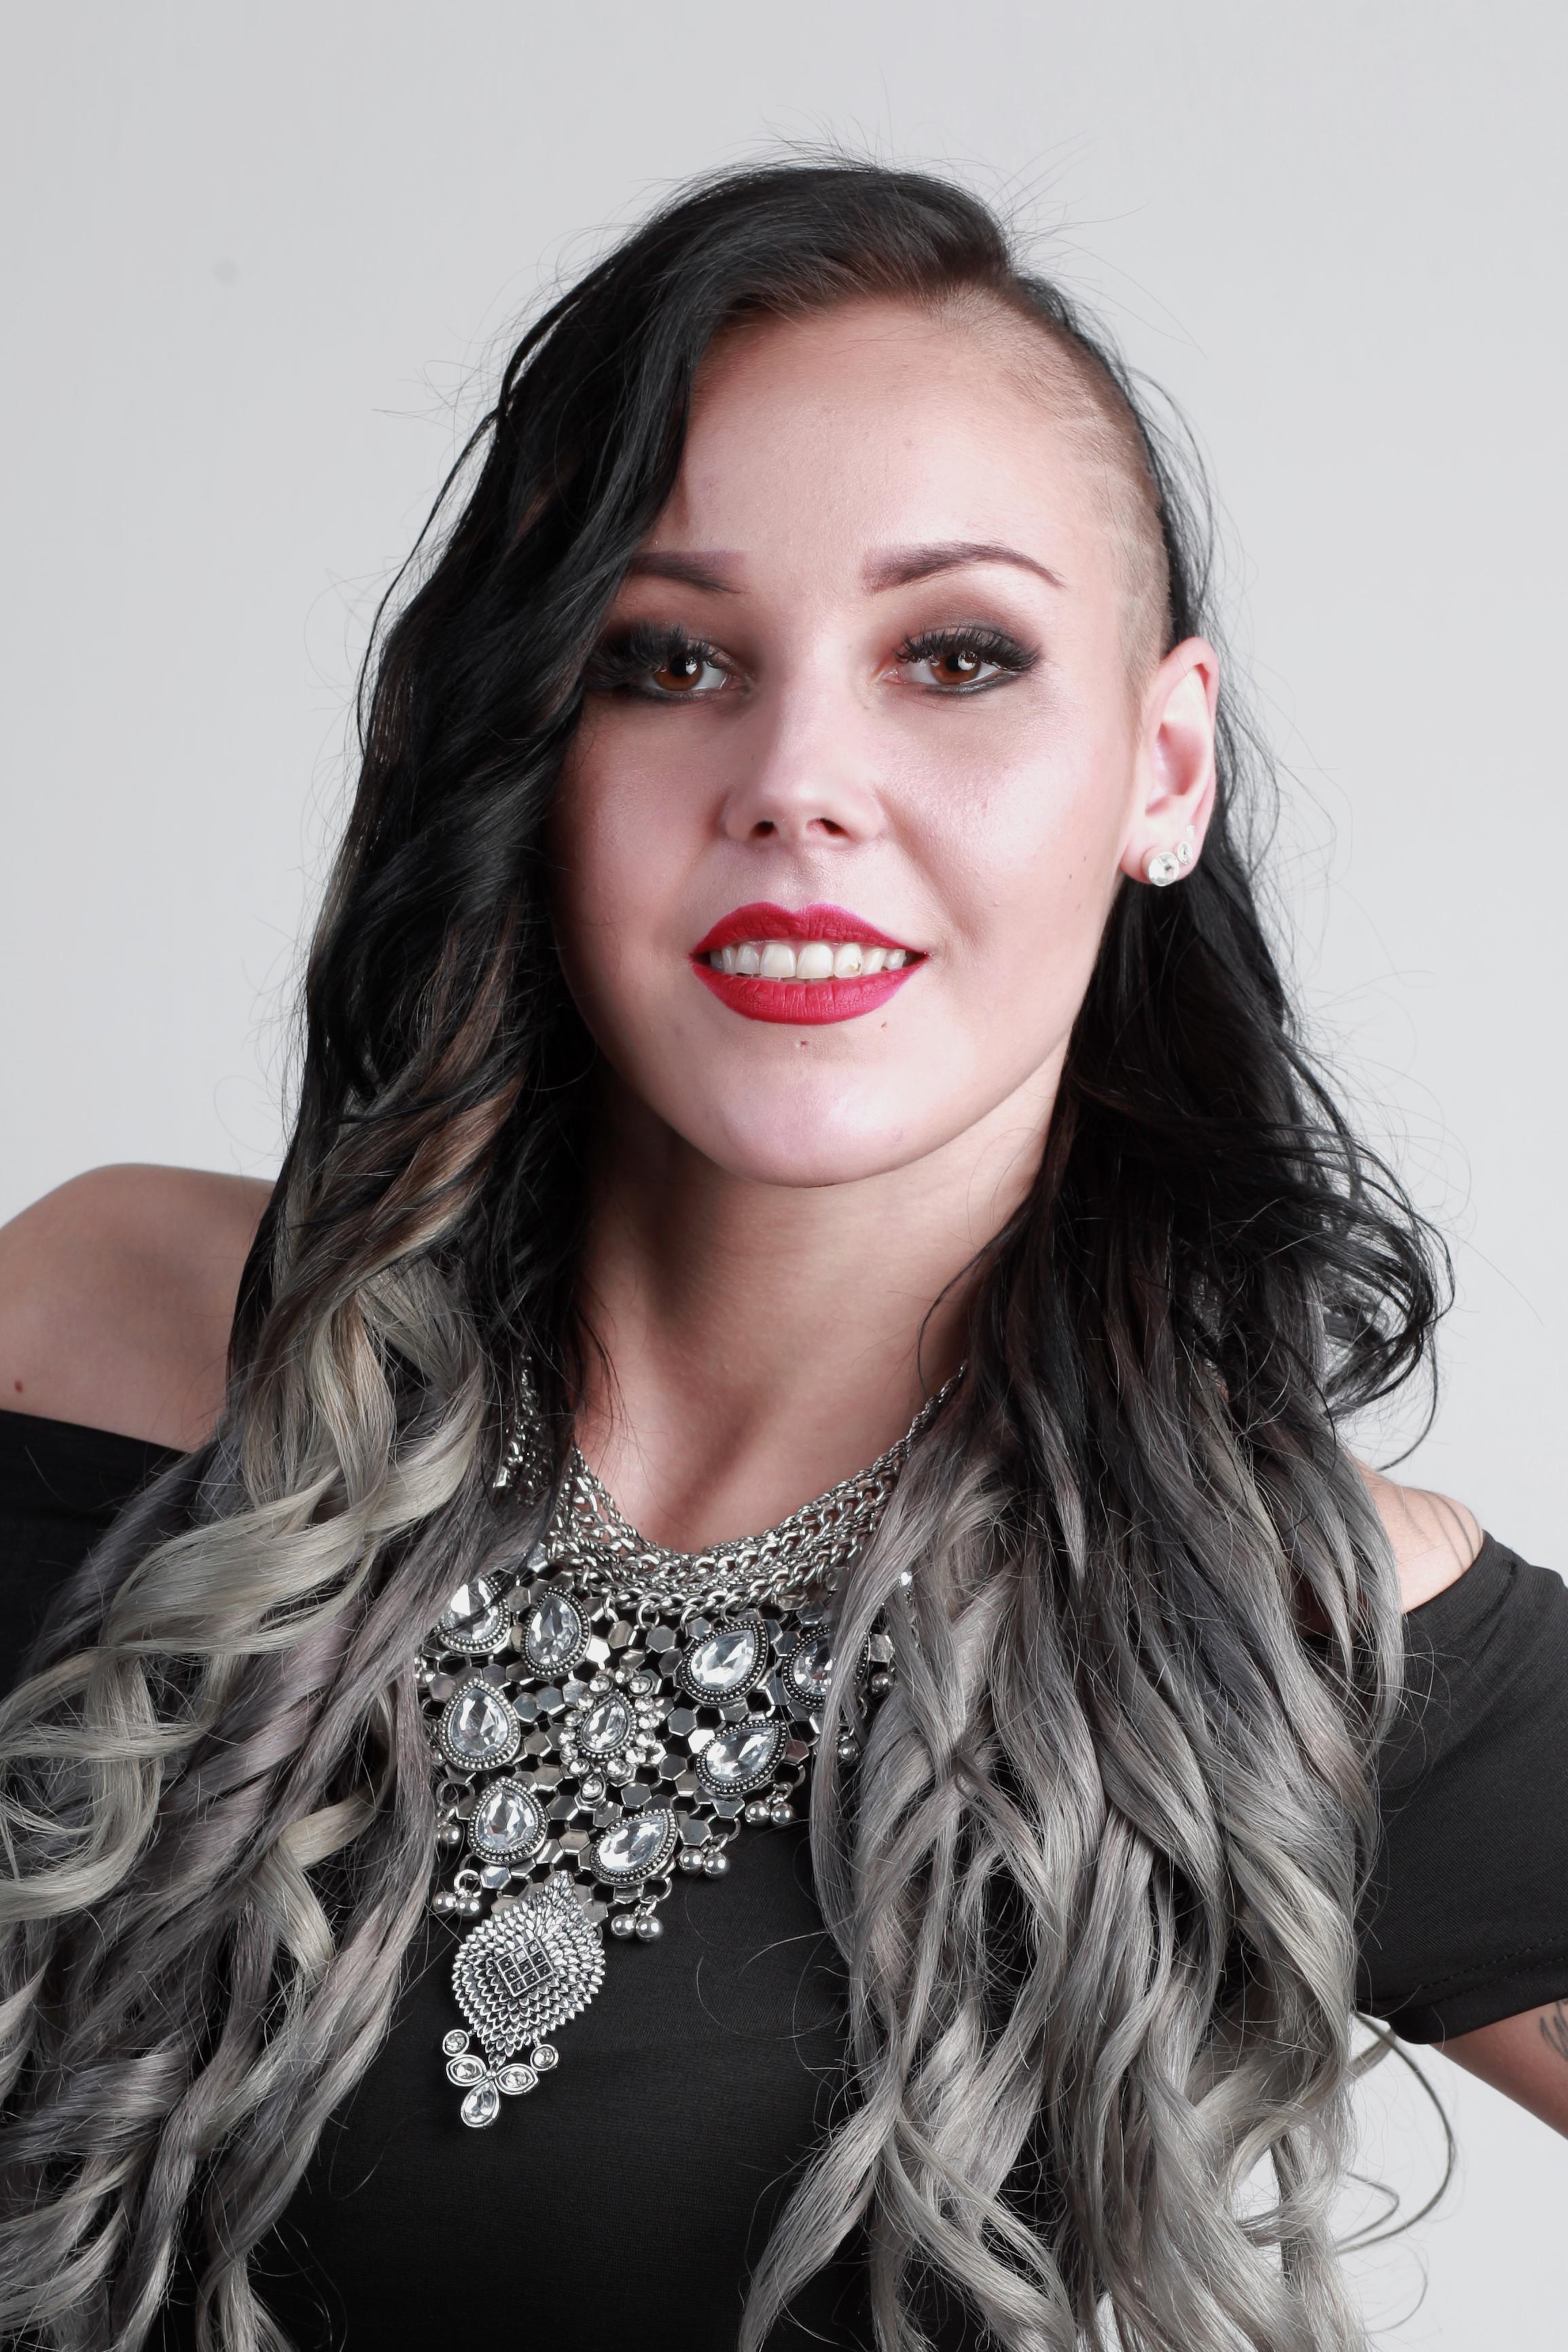 4. Heidi Yliniemi, 25, Kemi